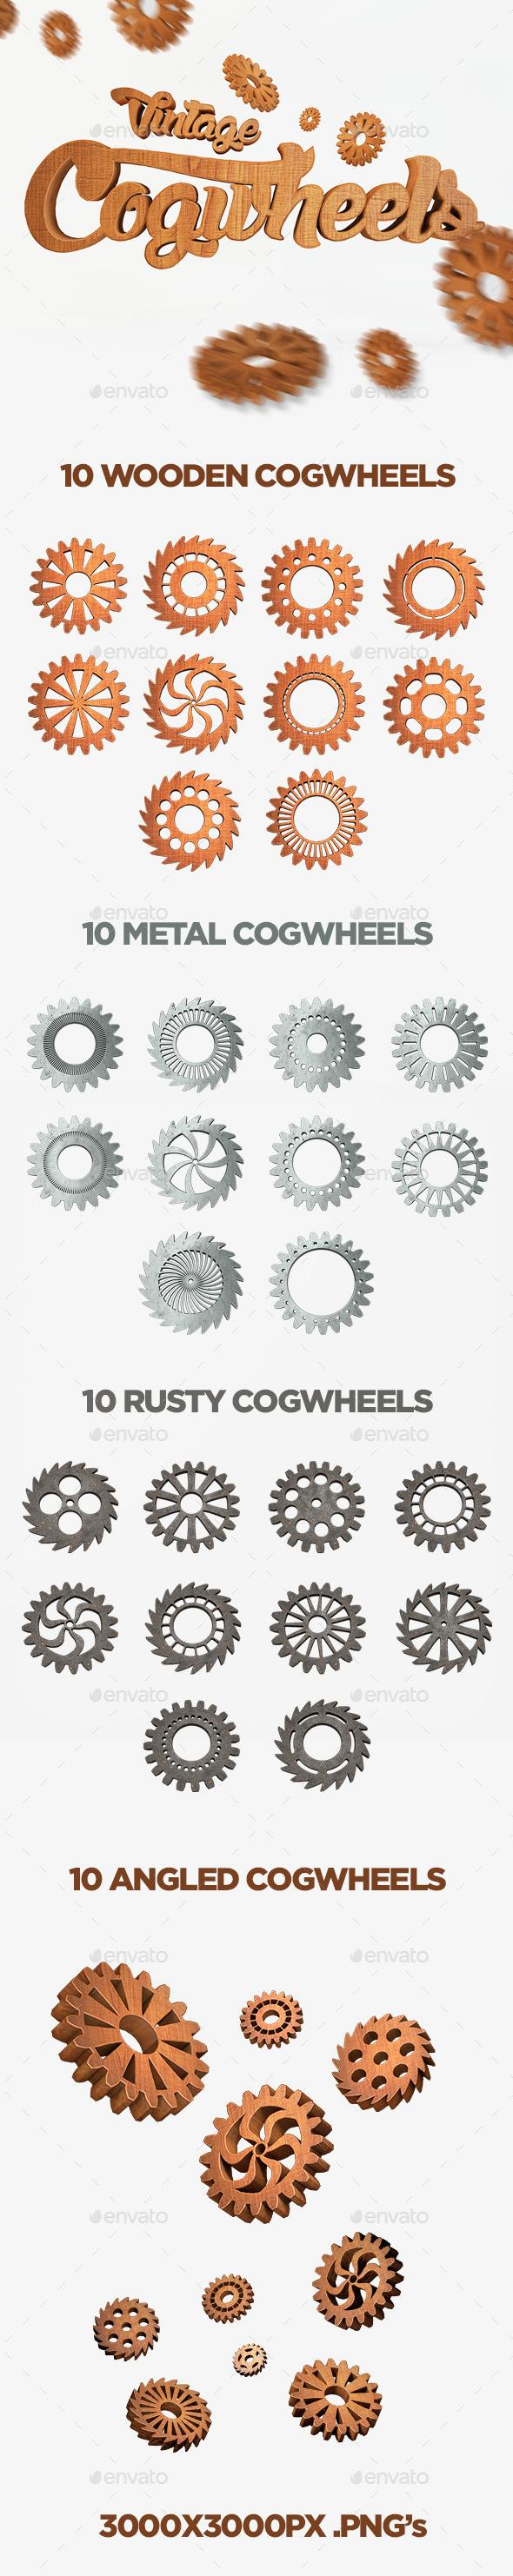 Vintage Cogwheels Set - Objects 3D Renders